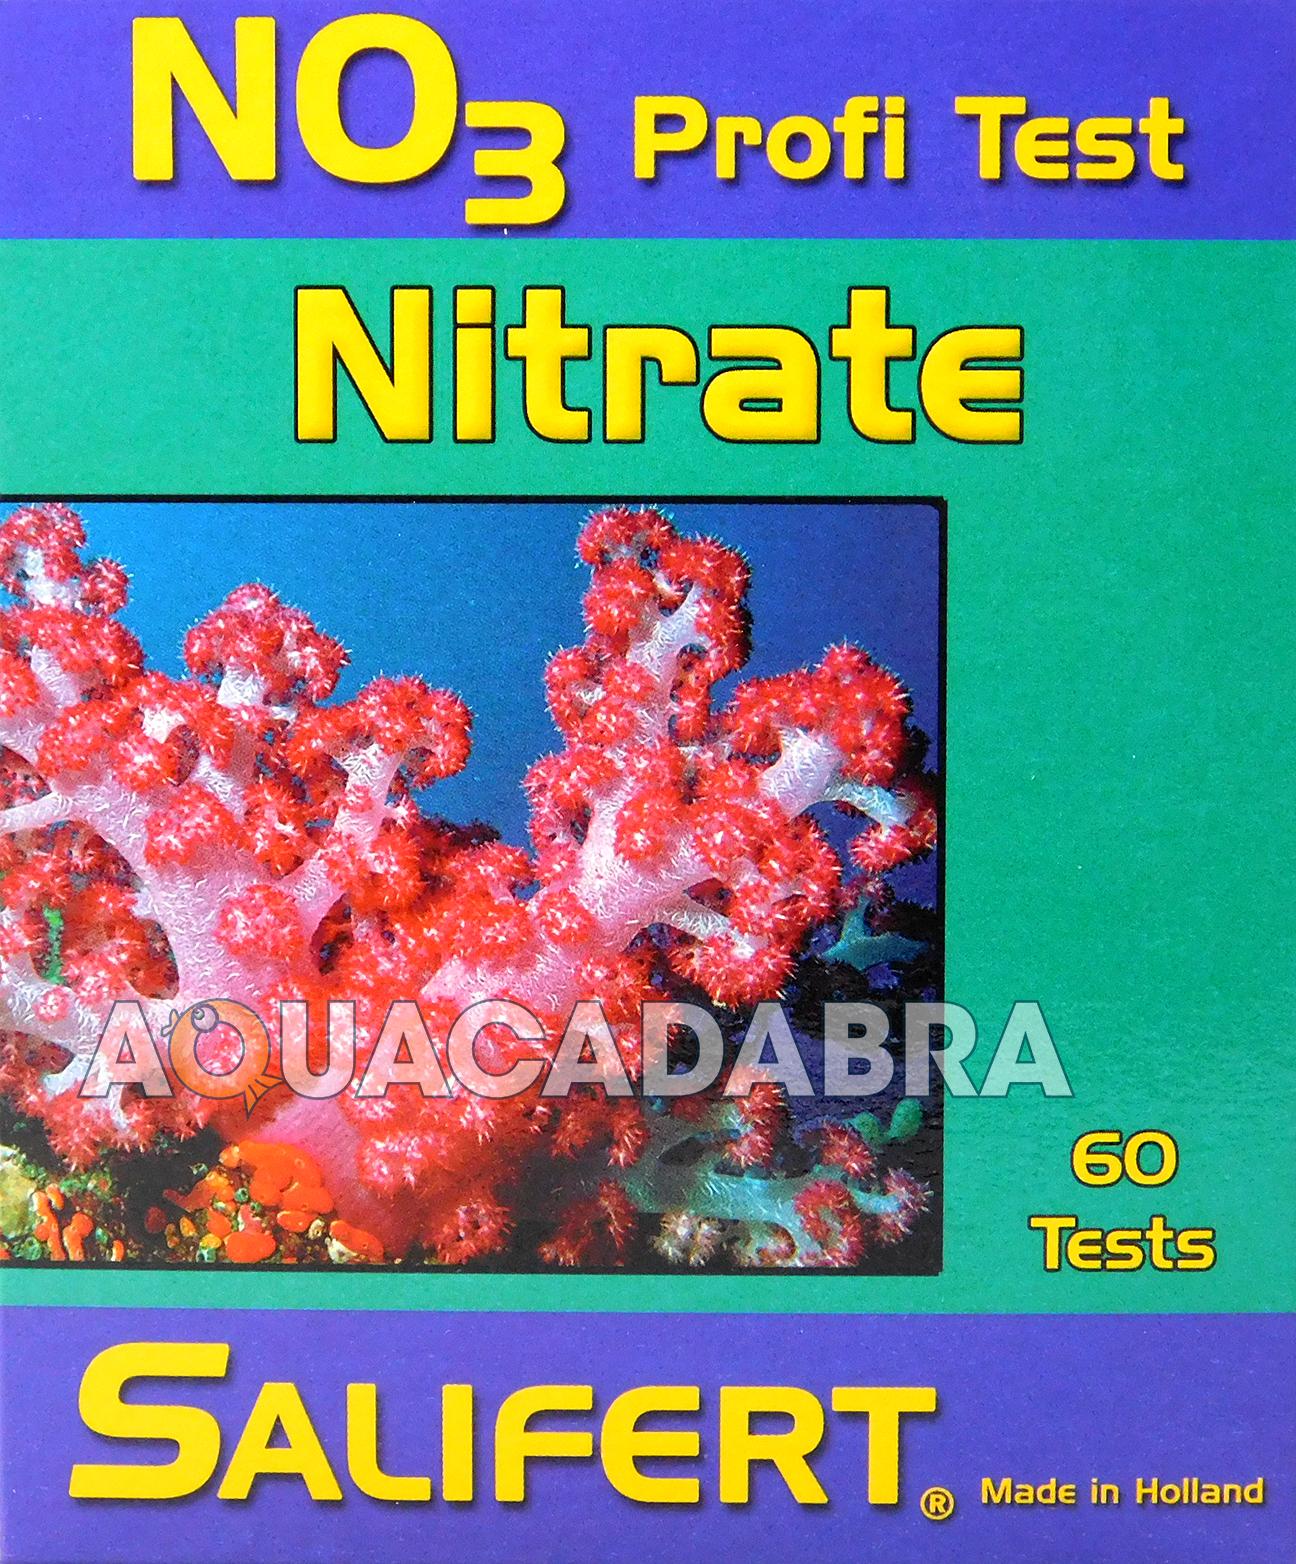 Salifert nitrate no3 profi test kit marine reef fish tank for High nitrite in fish tank